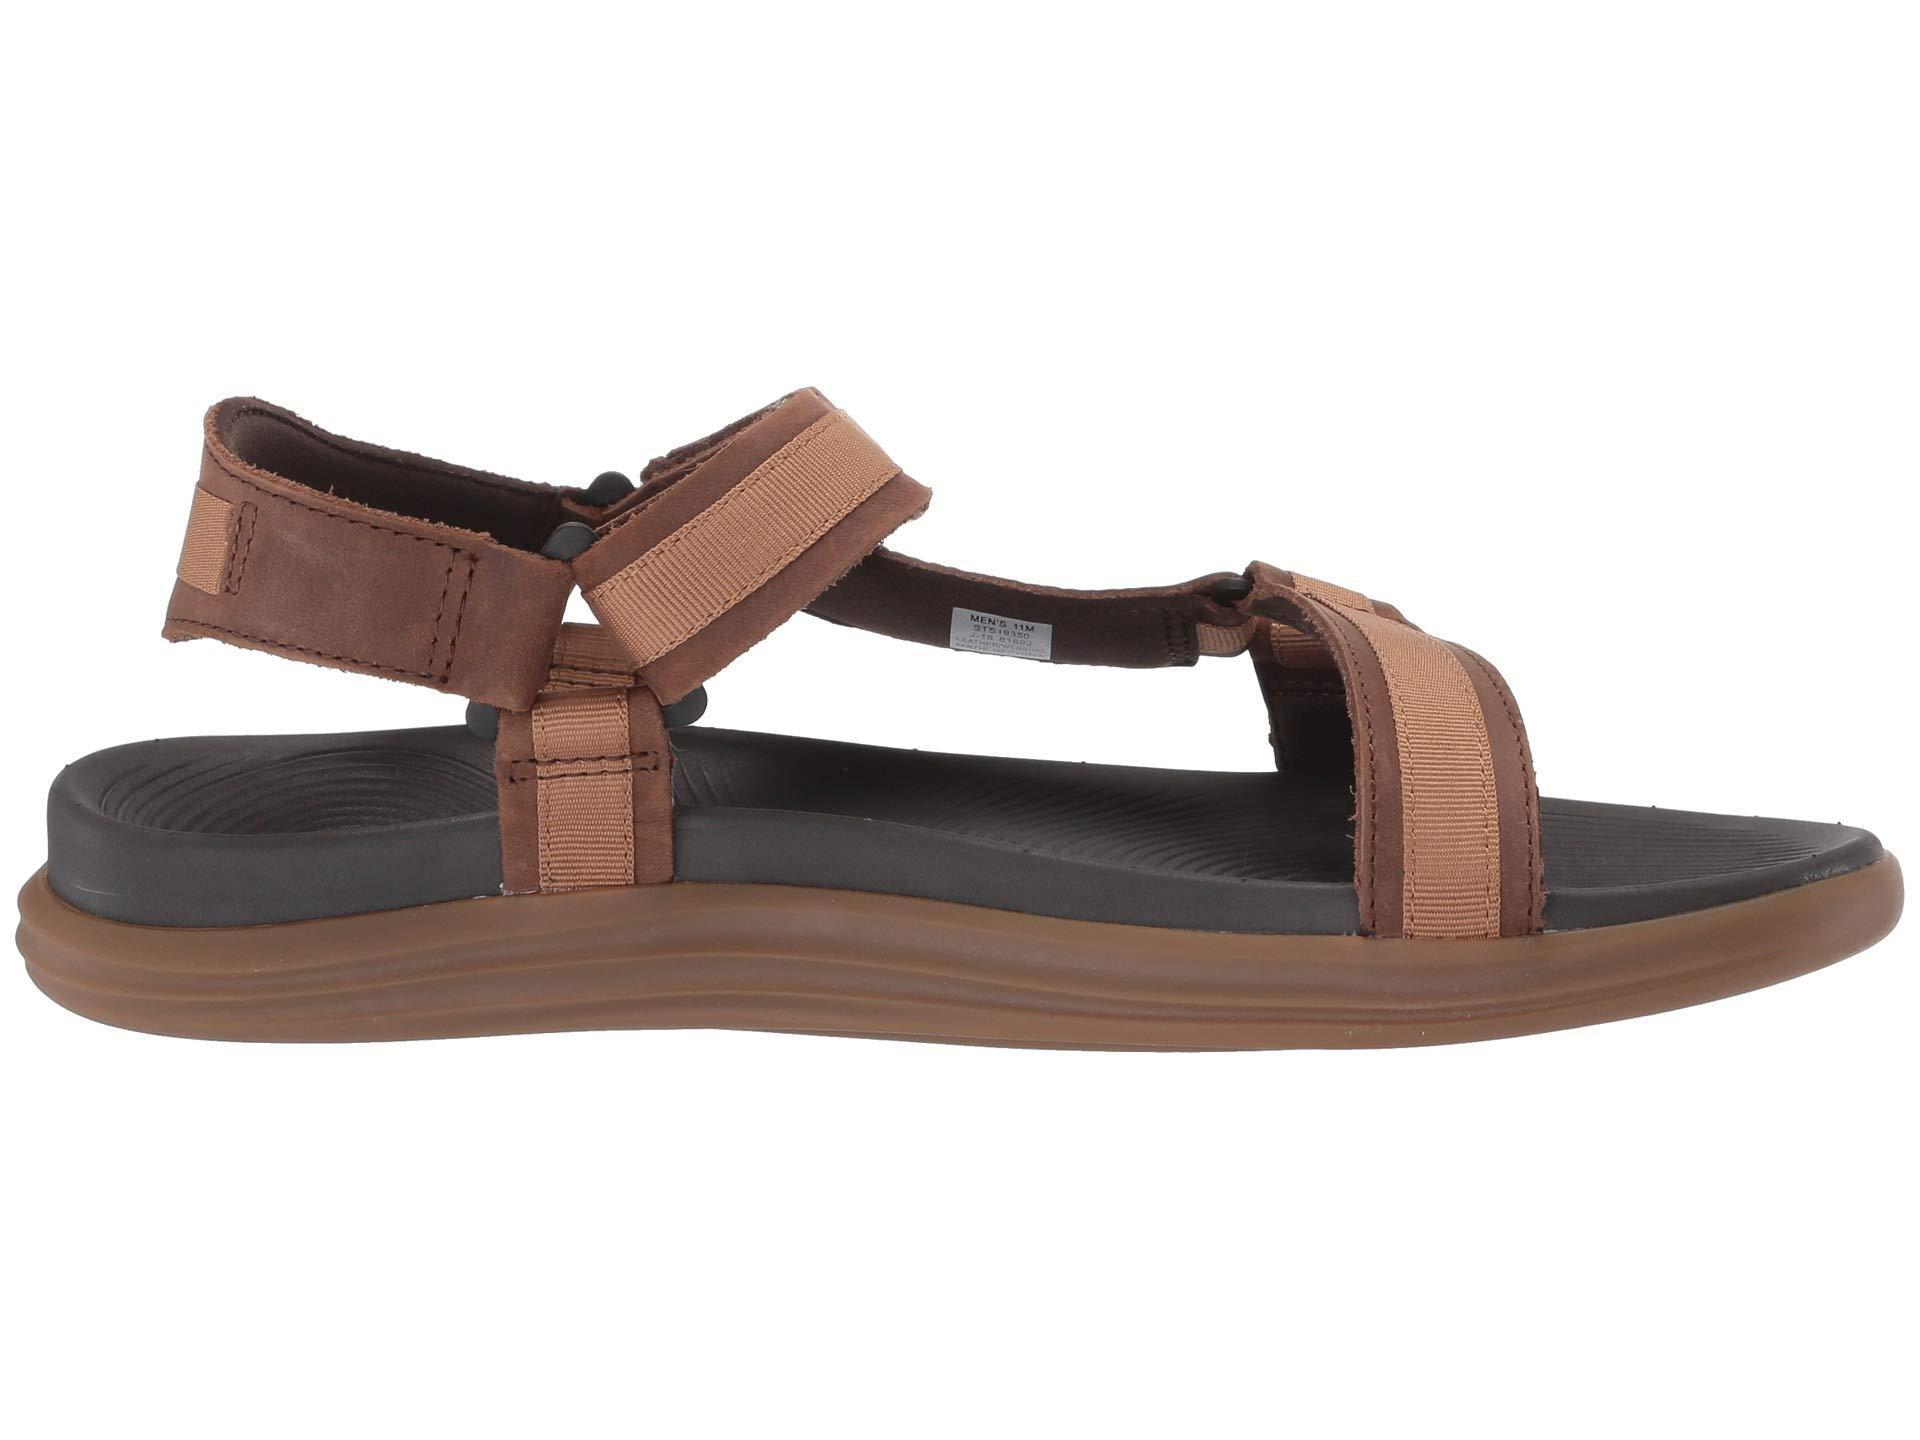 8843465db1f Lyst - Sperry Top-Sider Regatta 2-strap Sandal (brown tan) Men s Sandals in  Brown for Men